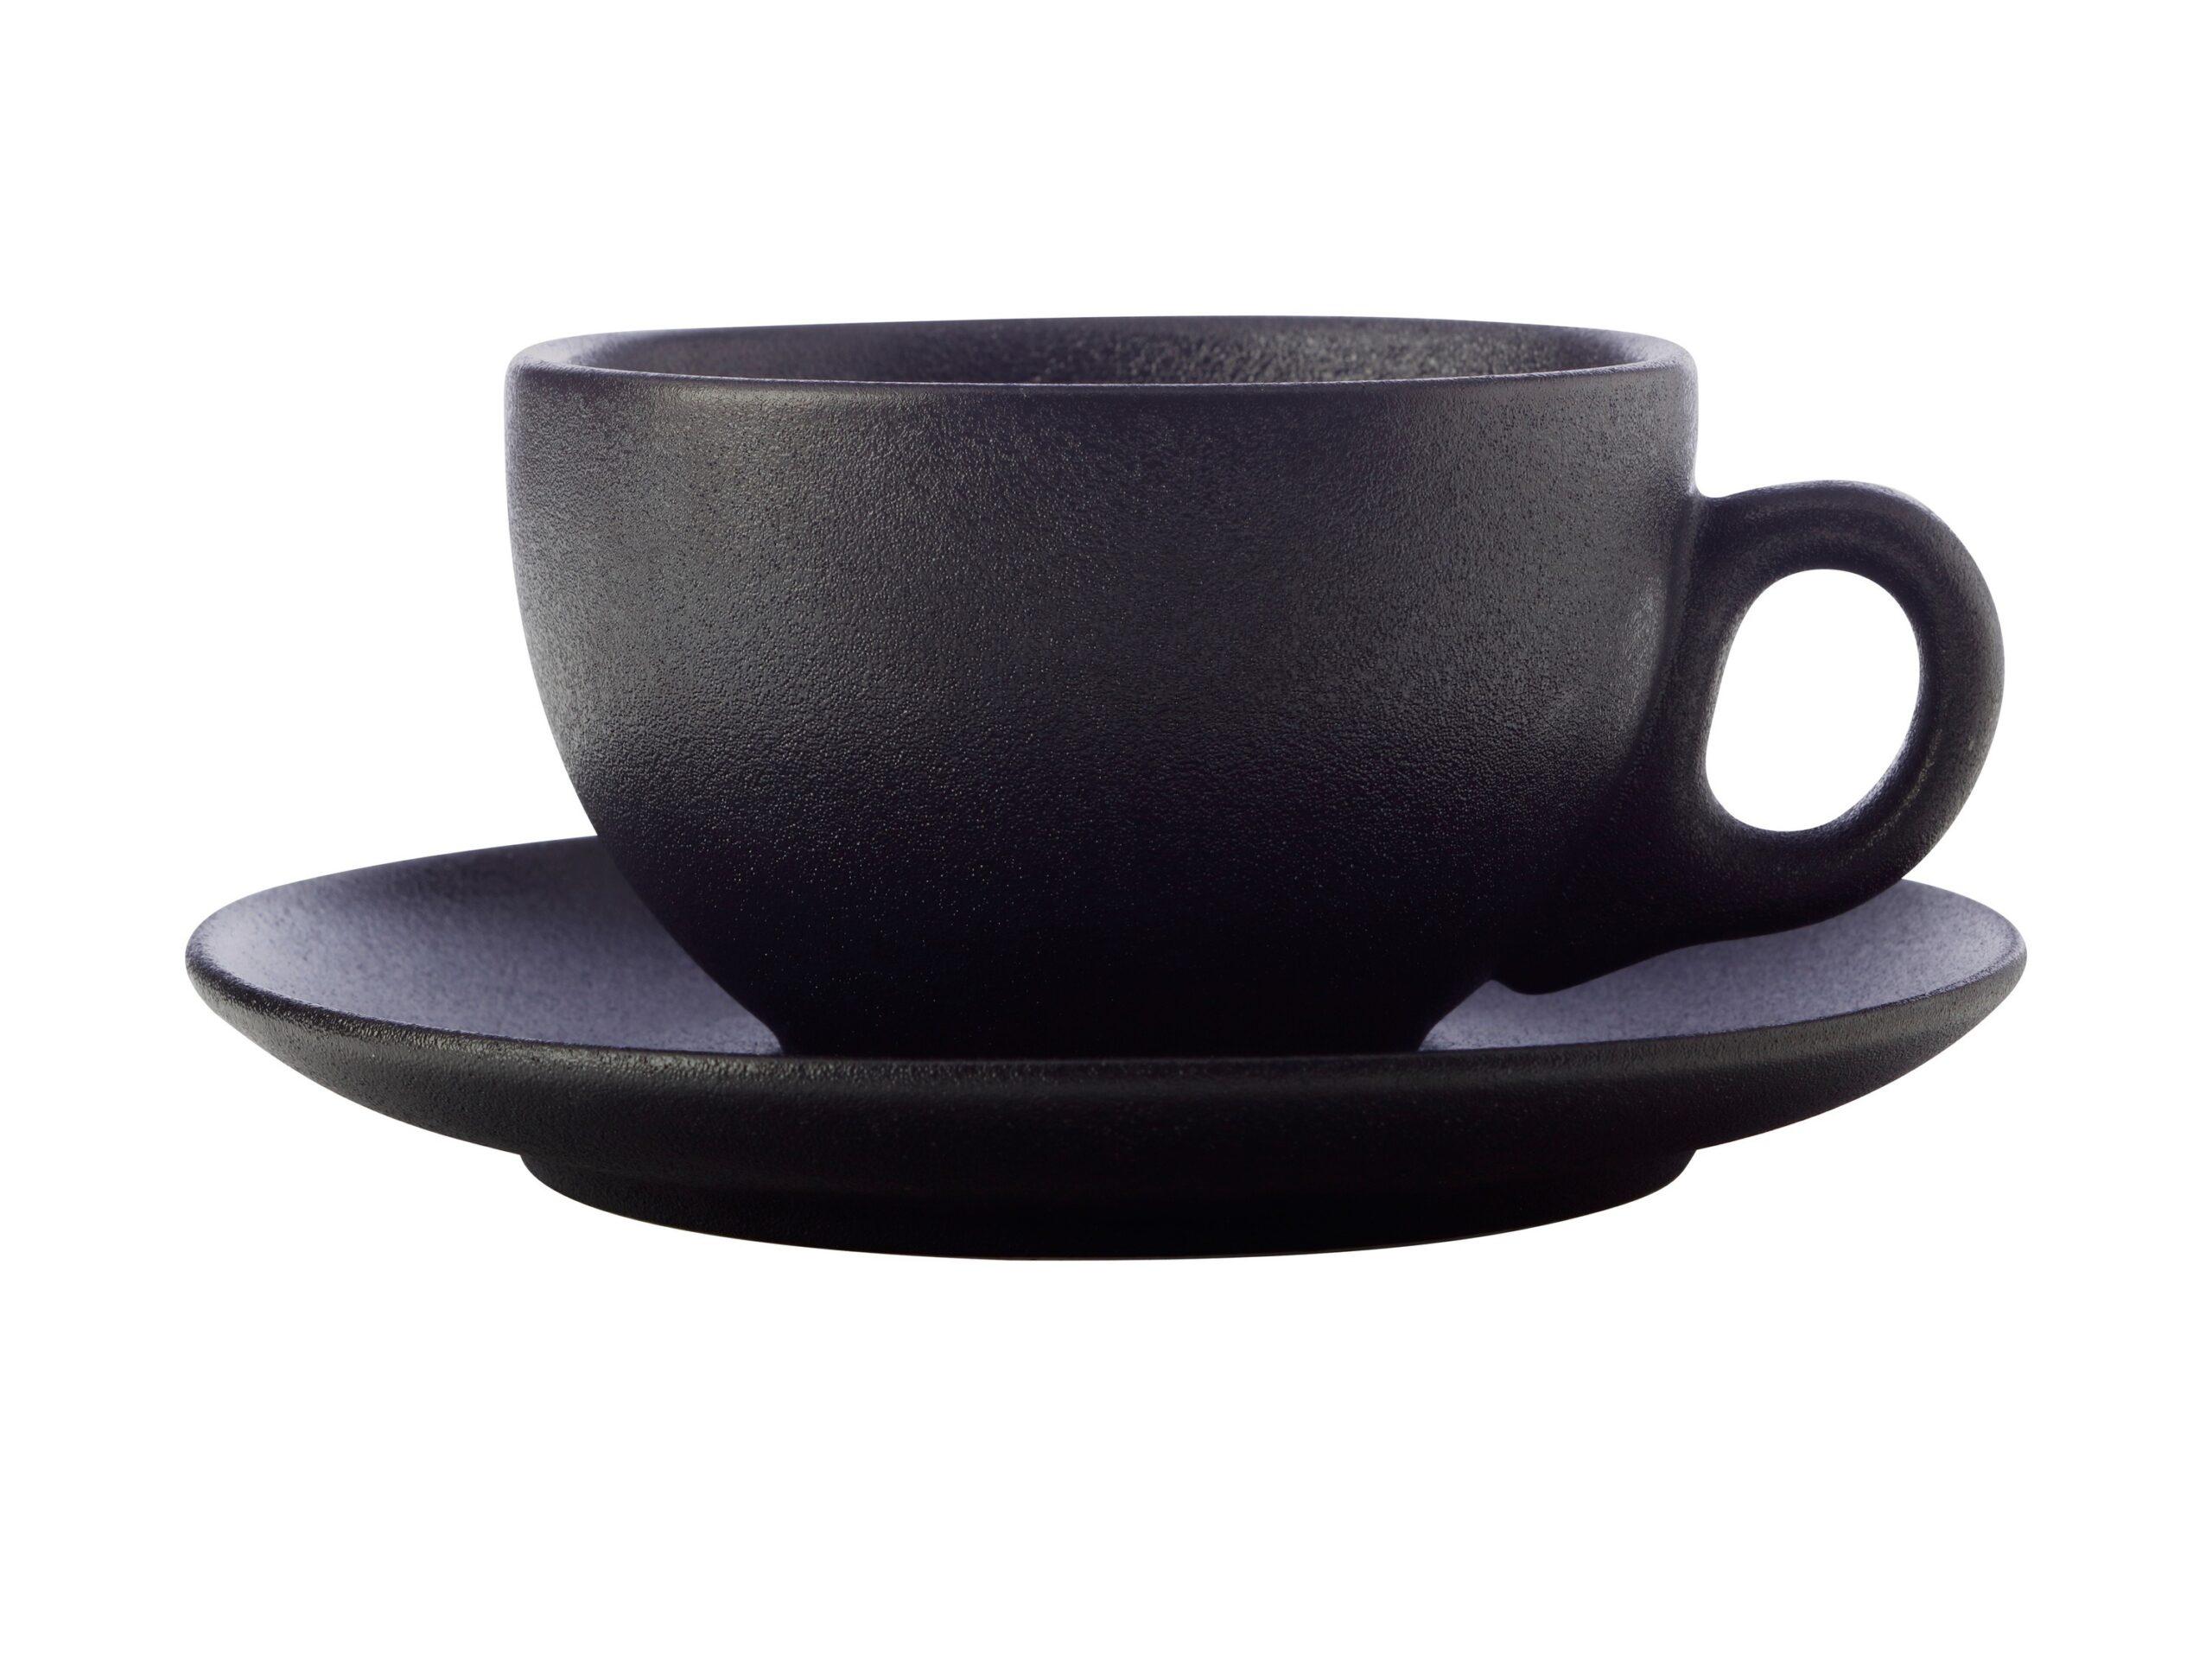 Maxwell Williams Caviar Cup & Saucer 250ml Black